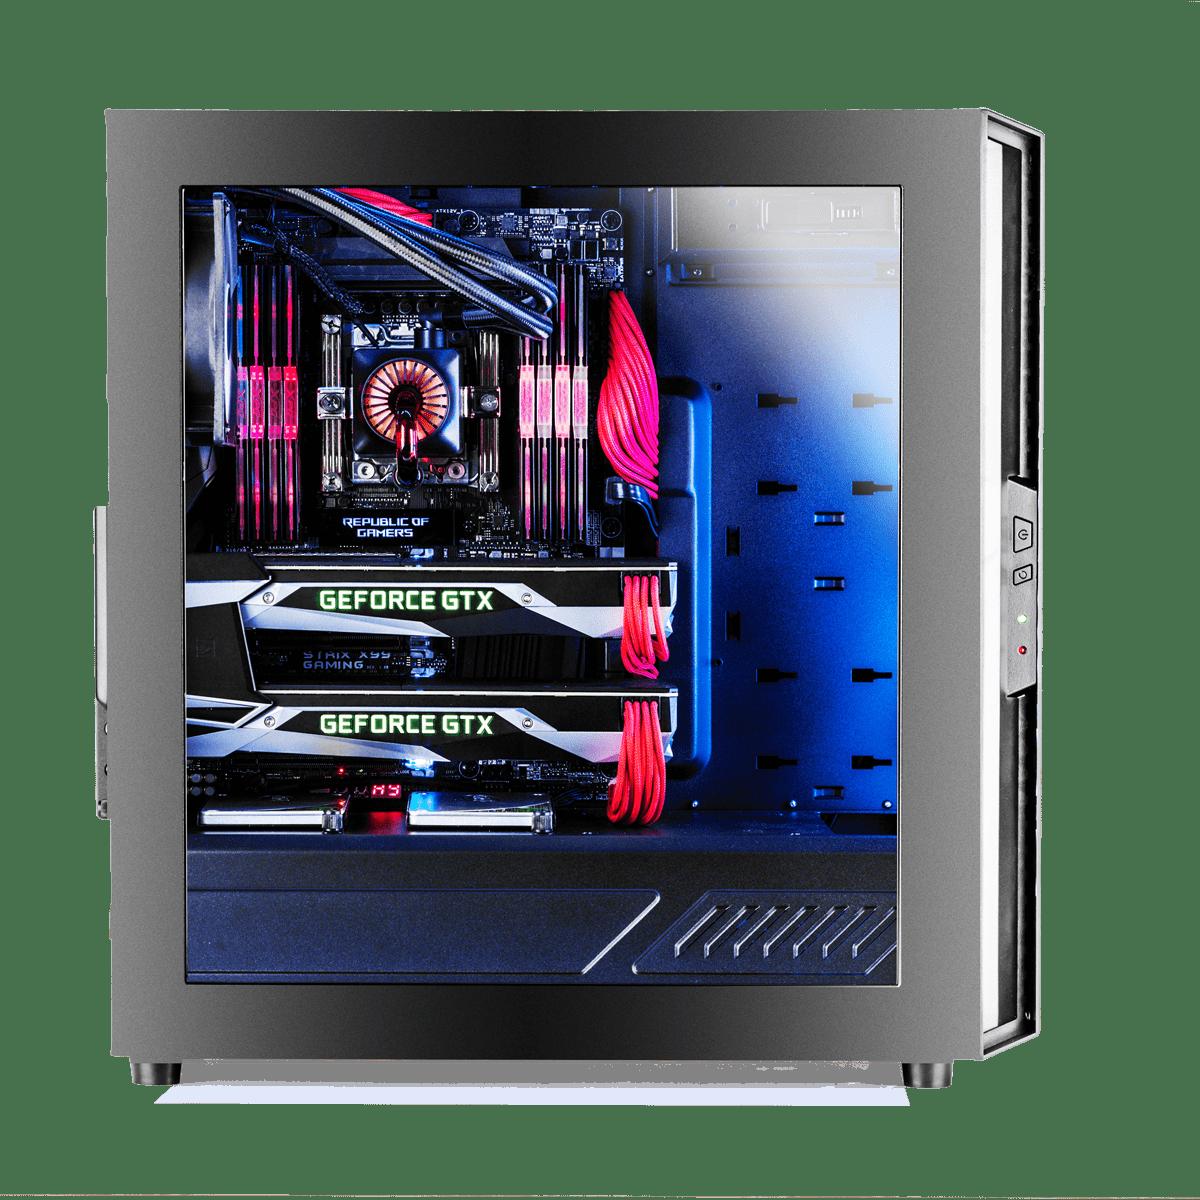 AMD Ryzen 5 Configurator